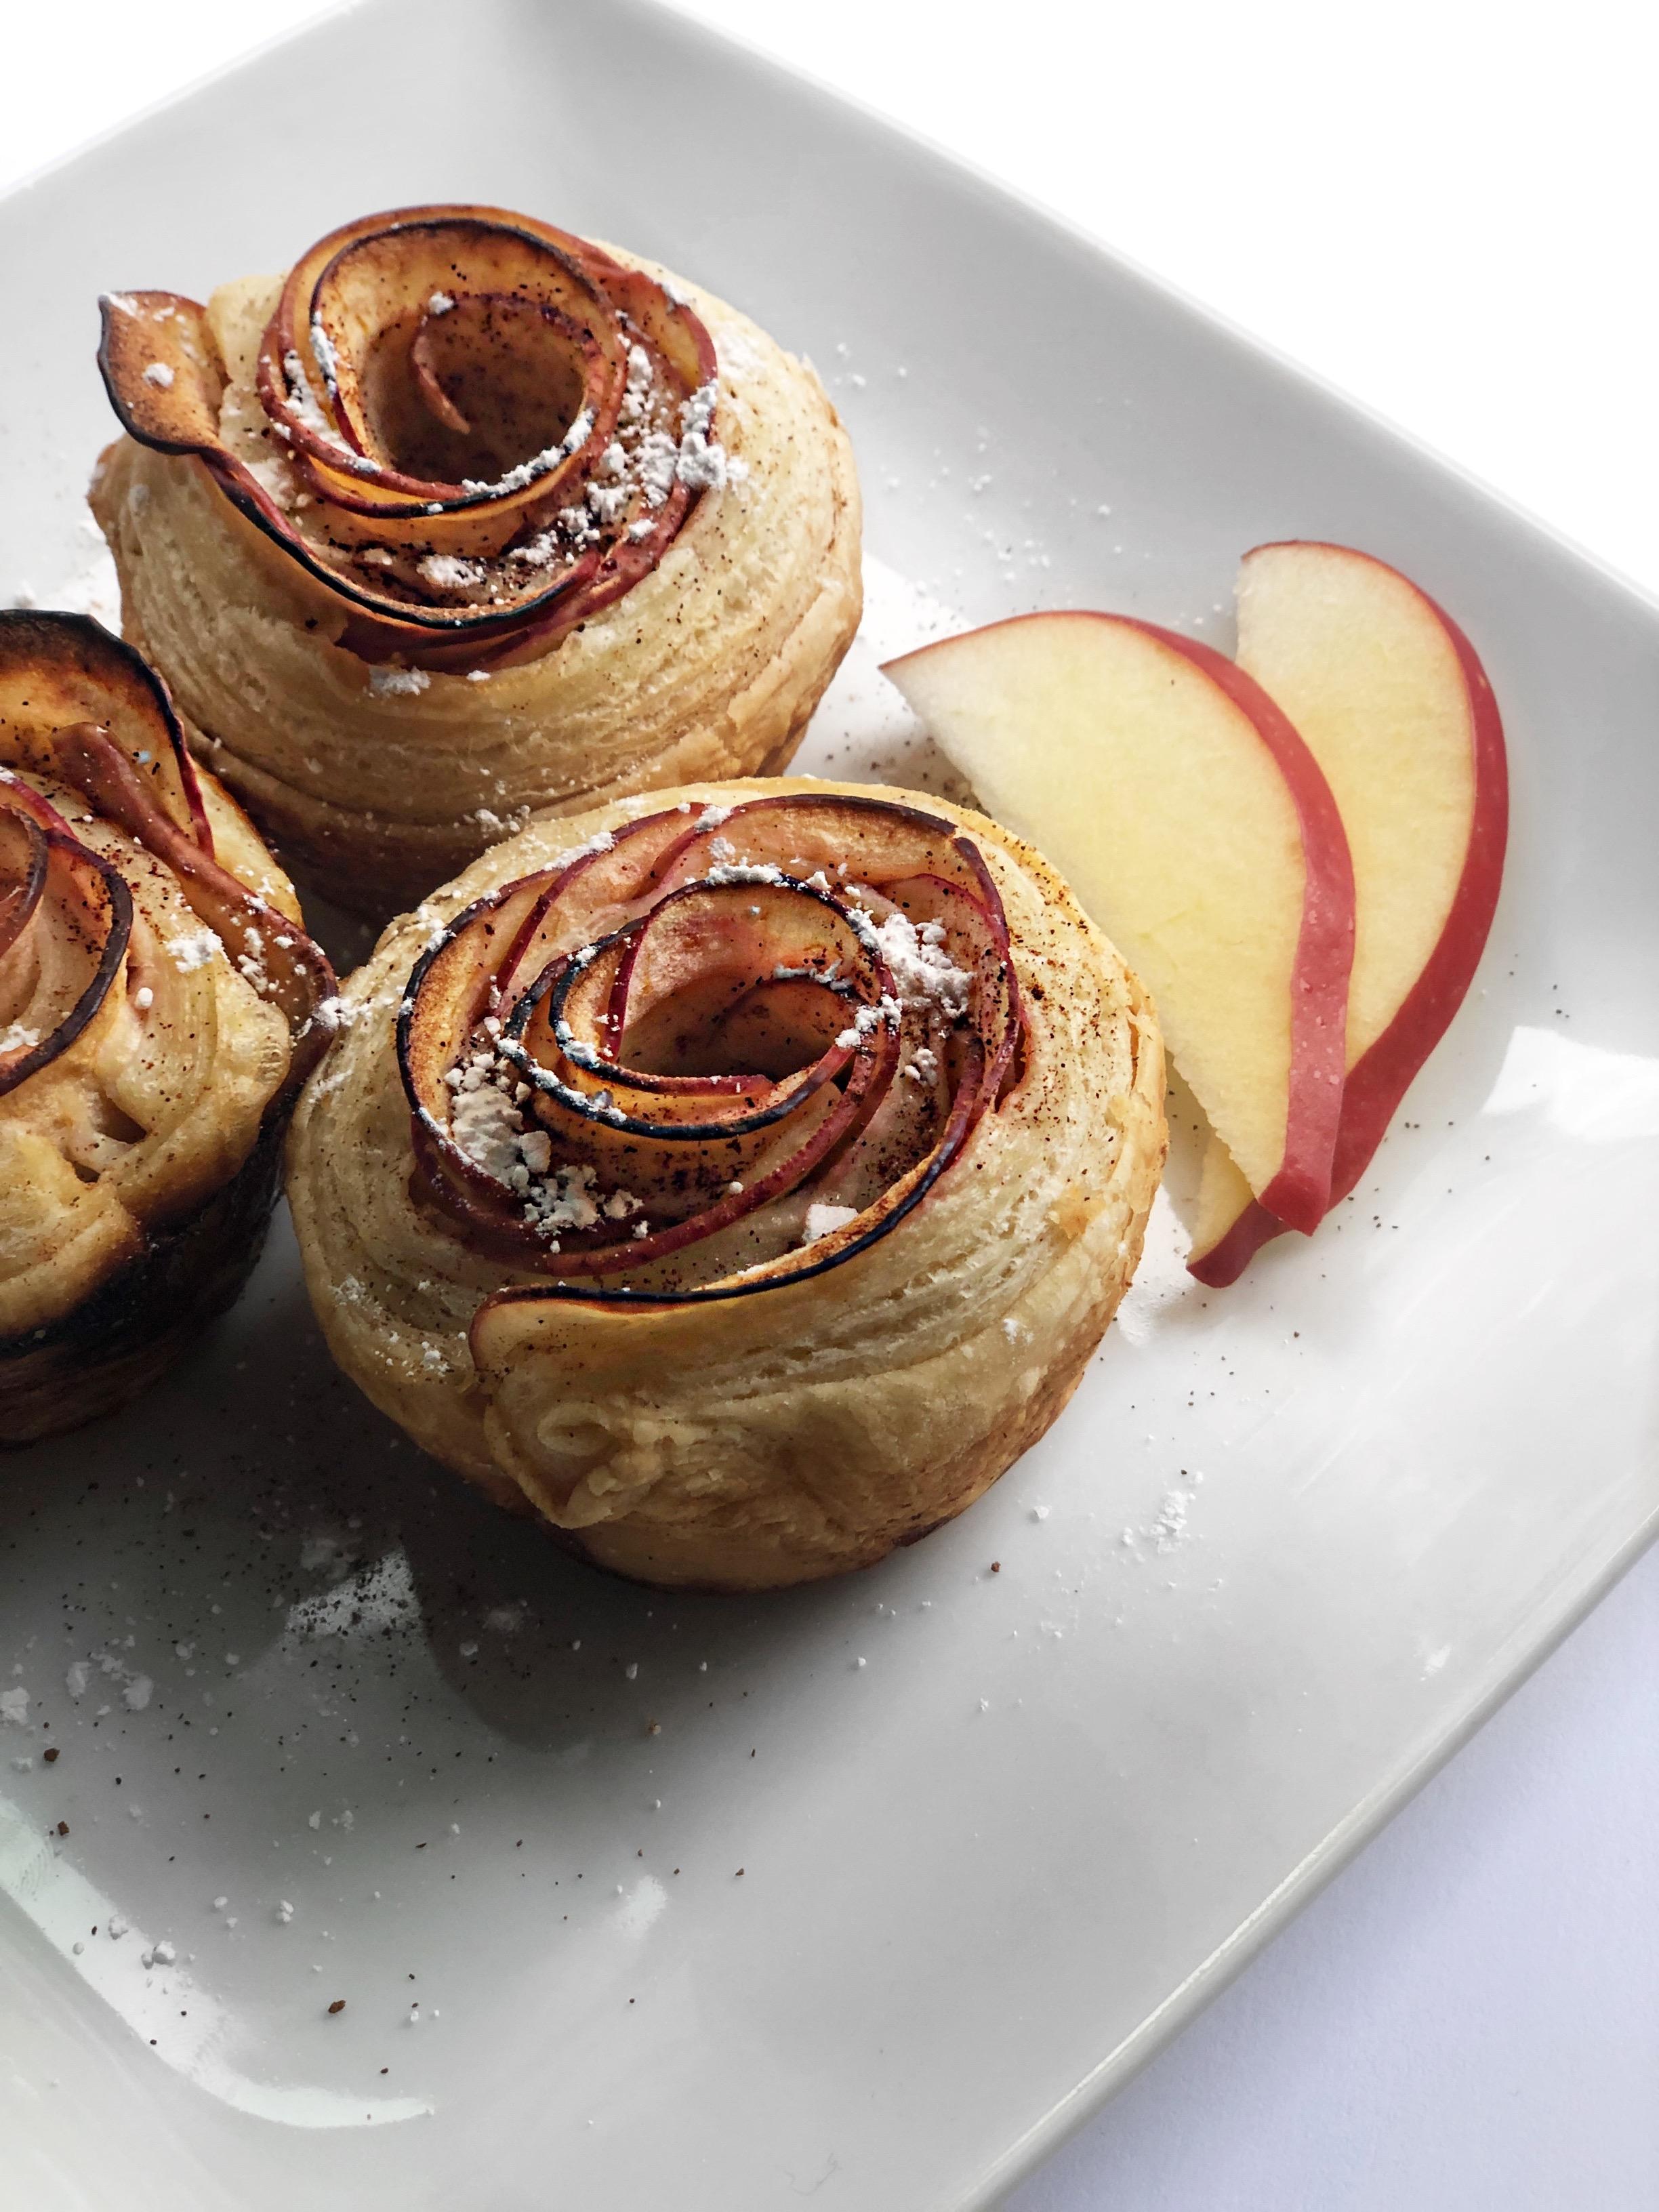 Baked Rose Apples